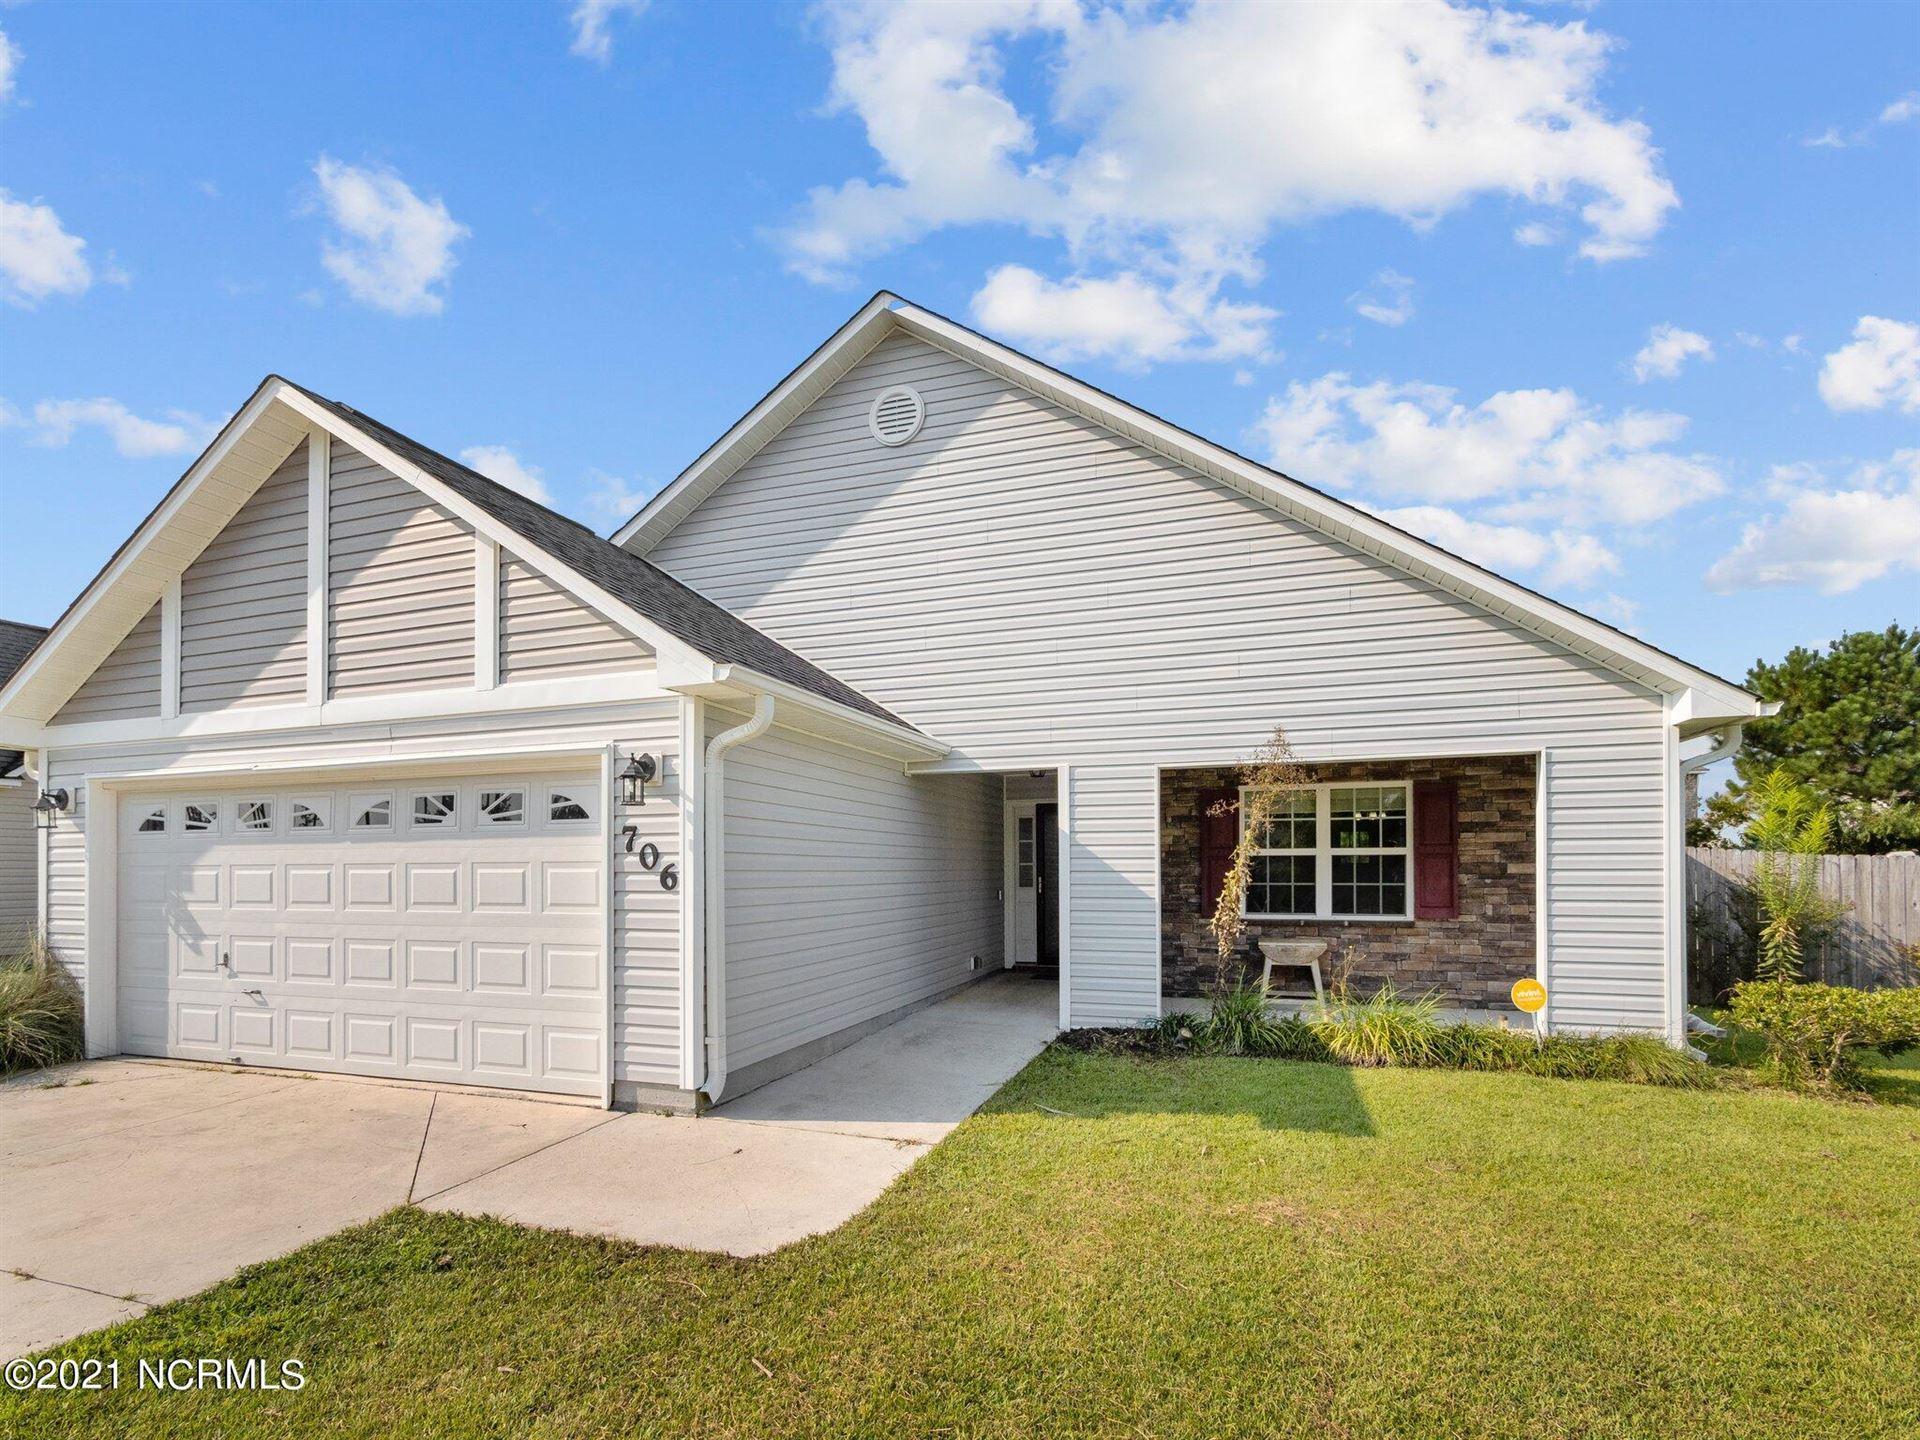 Photo of 706 Savannah Drive, Jacksonville, NC 28546 (MLS # 100291161)